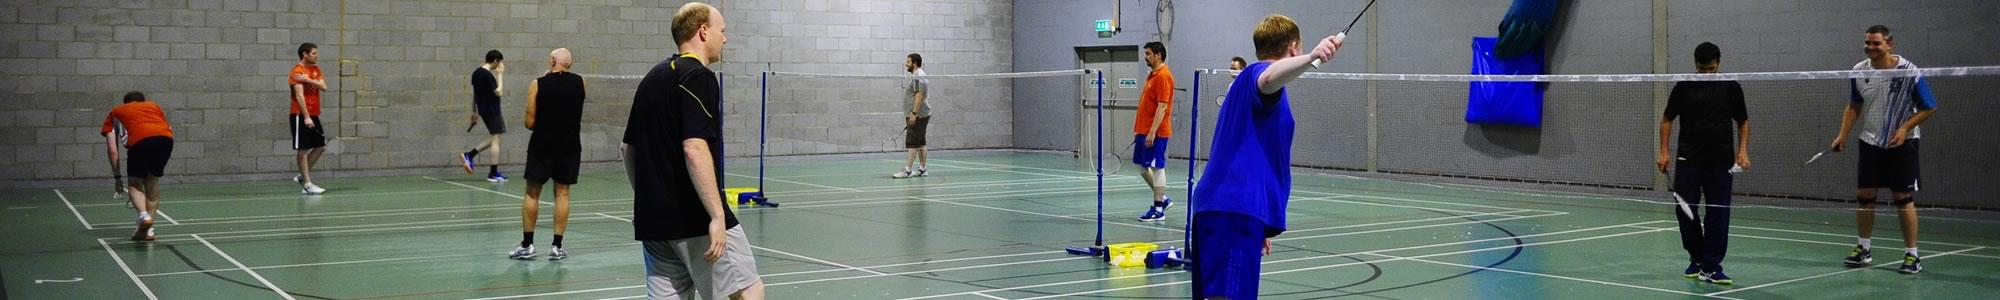 Four Oaks Badminton Club - Streetly